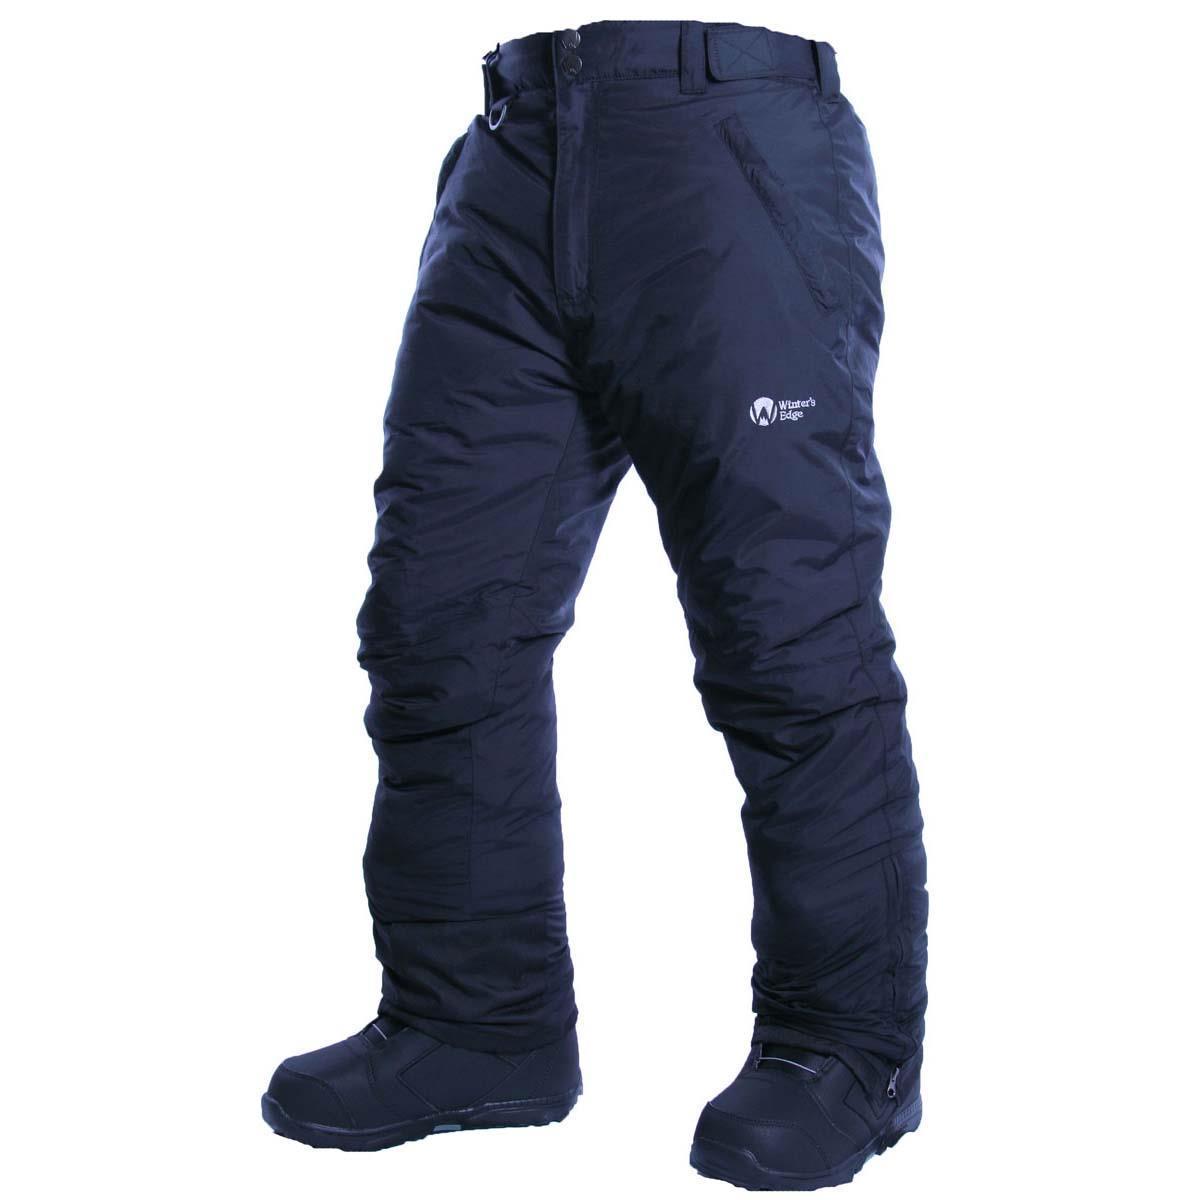 winter 39 s edge avalanche snow pants men 39 s. Black Bedroom Furniture Sets. Home Design Ideas